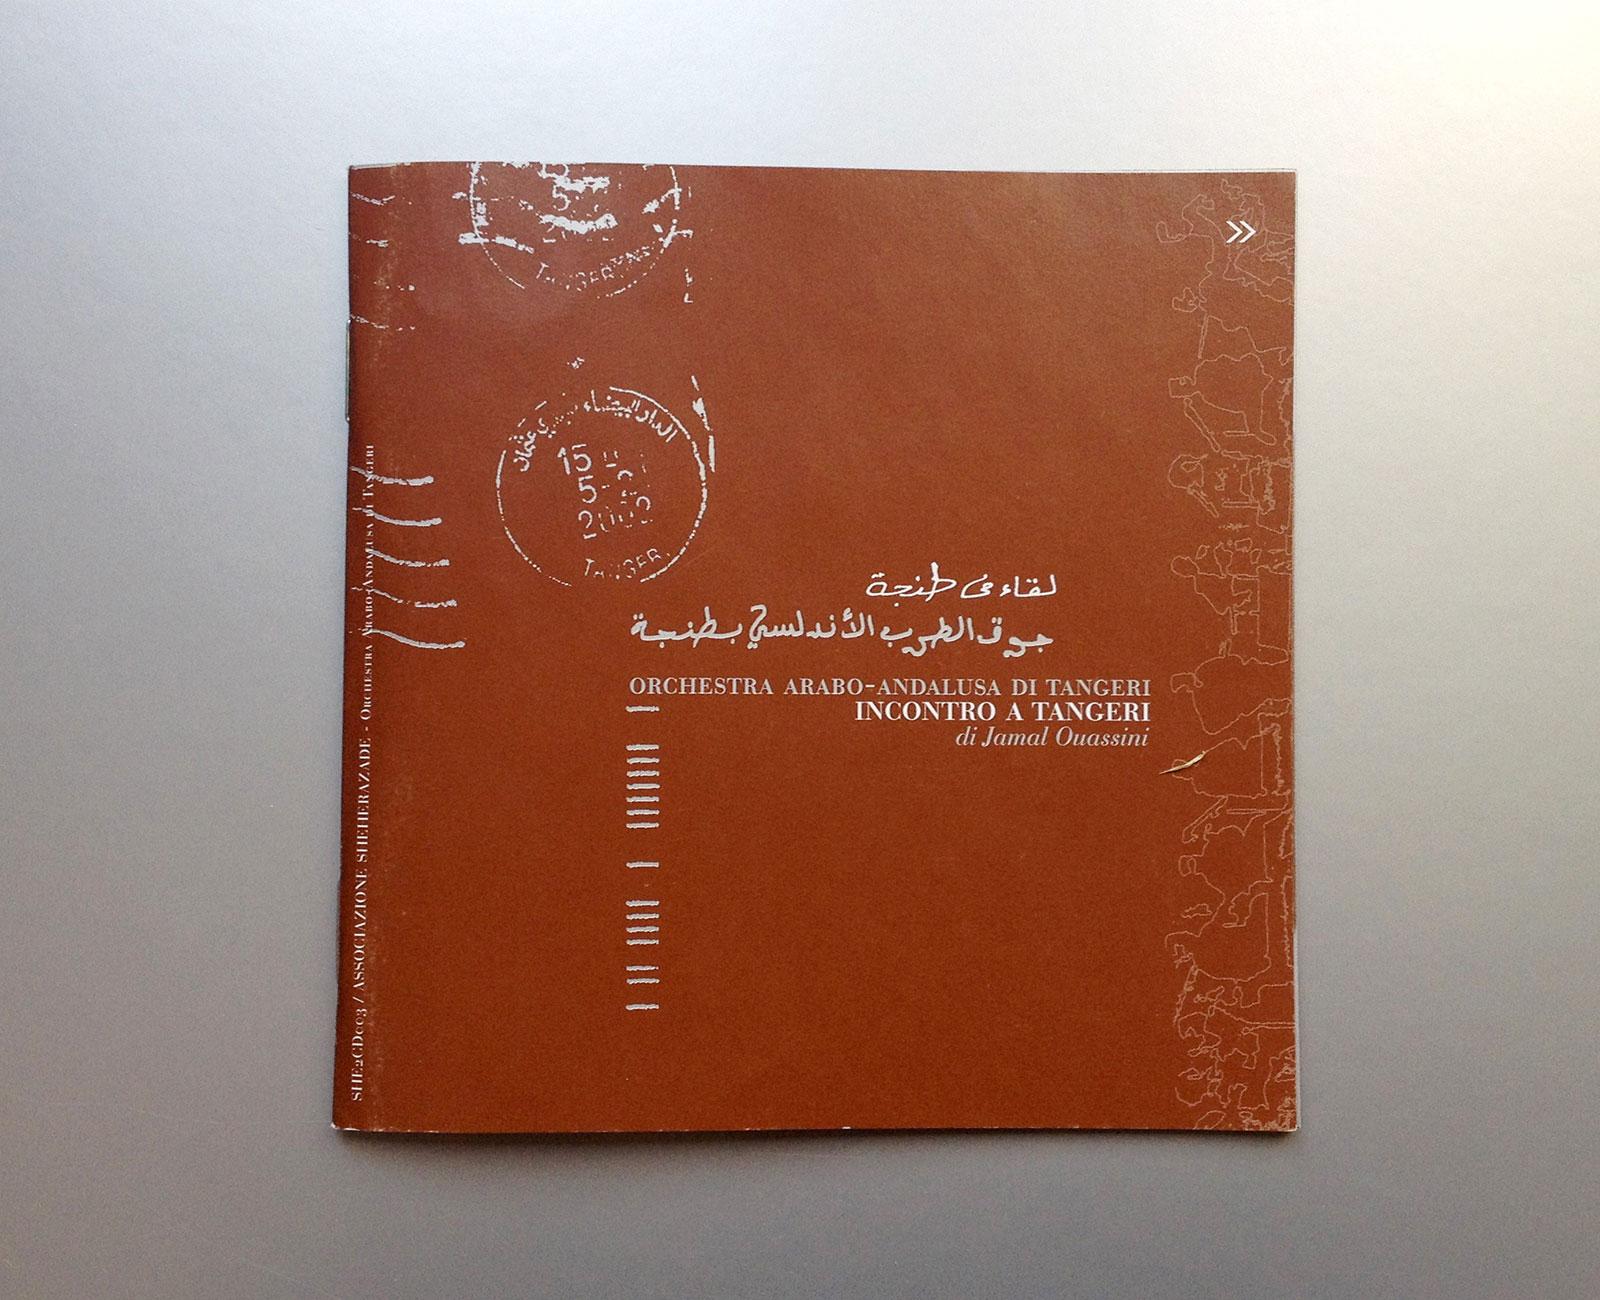 CD-INCONTRO-A-TANGERI-libretto7